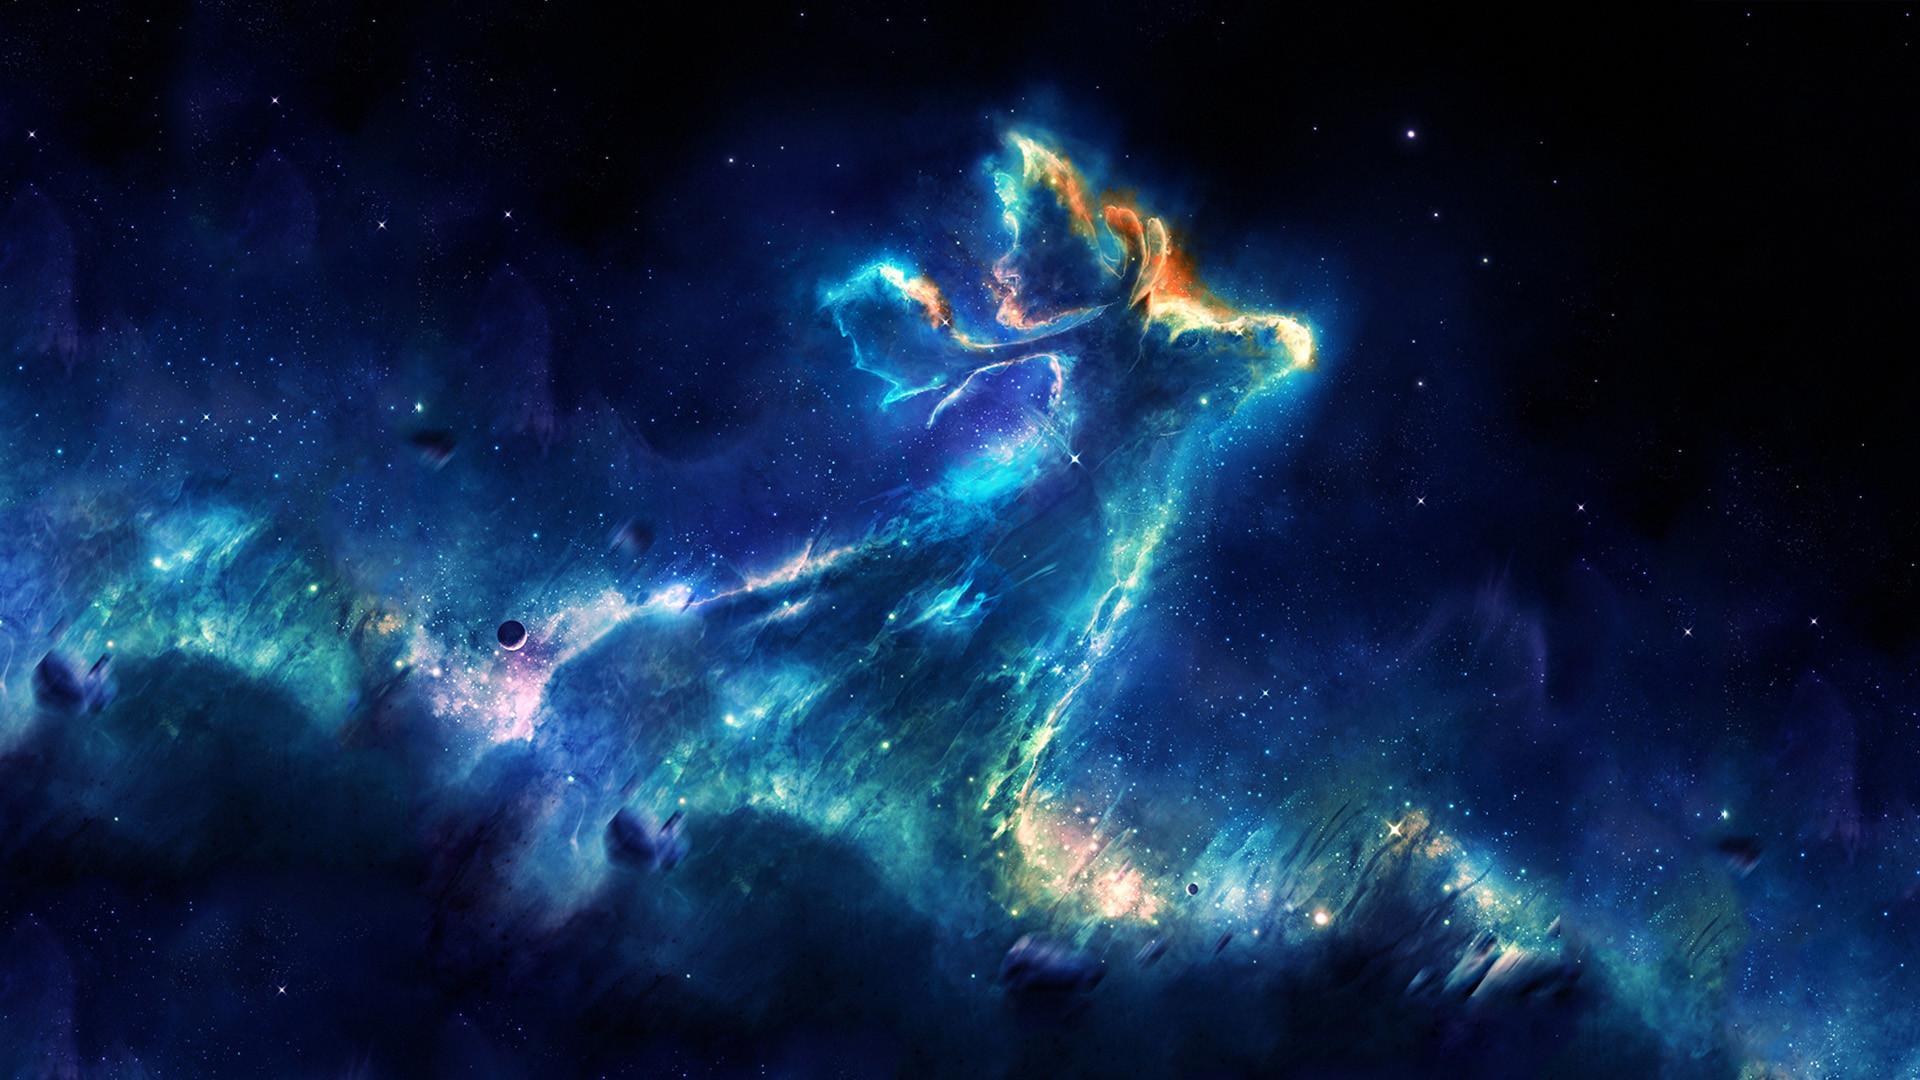 General space stars nebula space art digital art